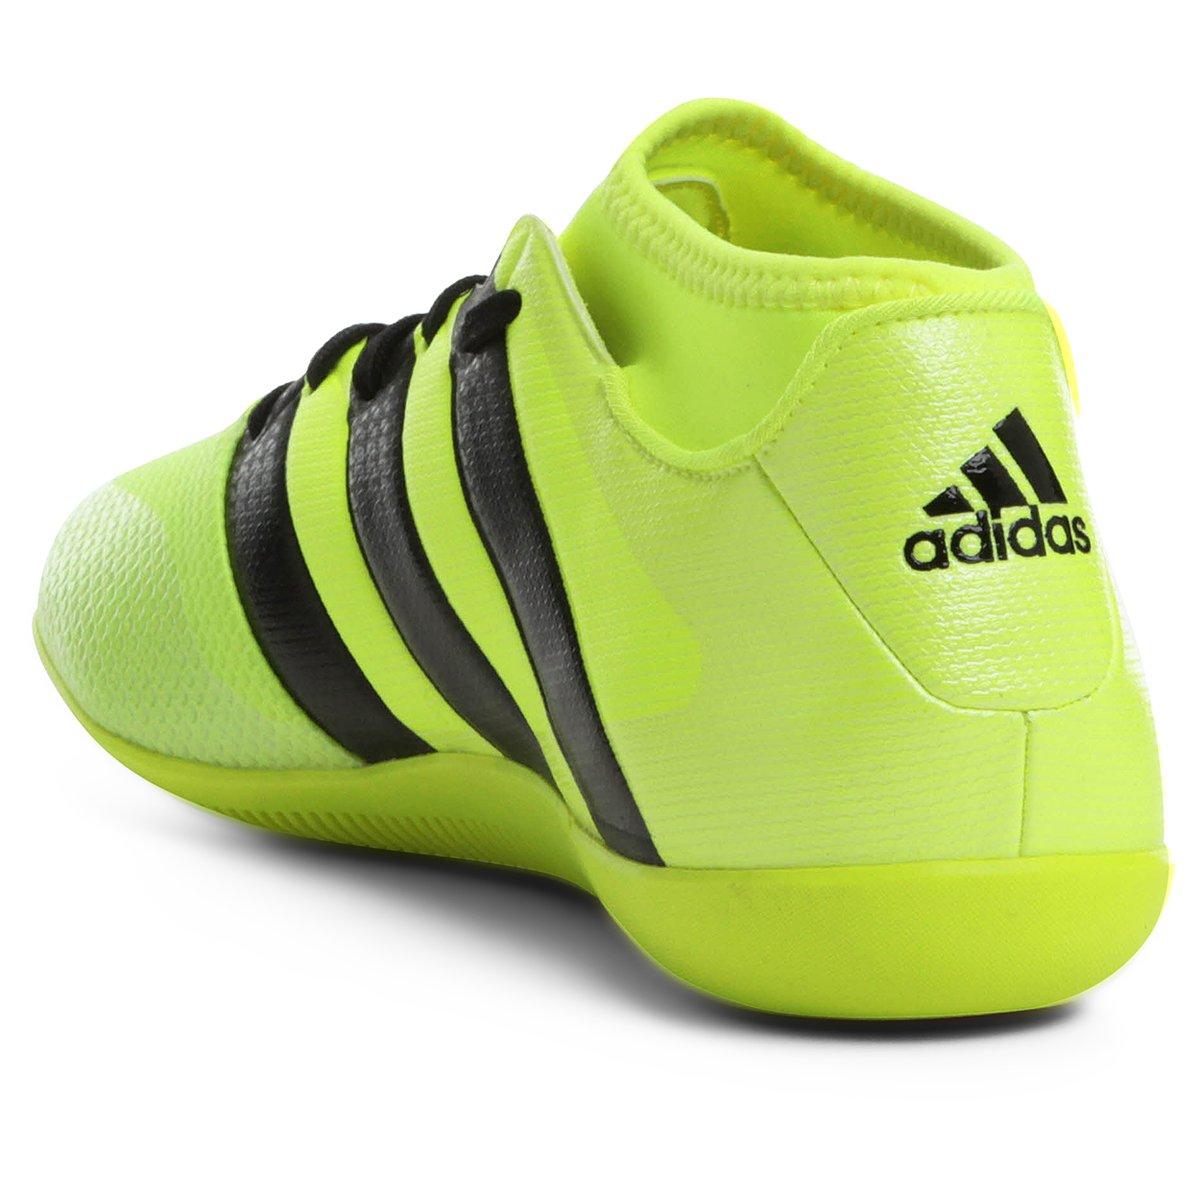 539275611c Chuteira Futsal Adidas Ace 16.3 Primemesh IN Masculina - Verde Limão ...